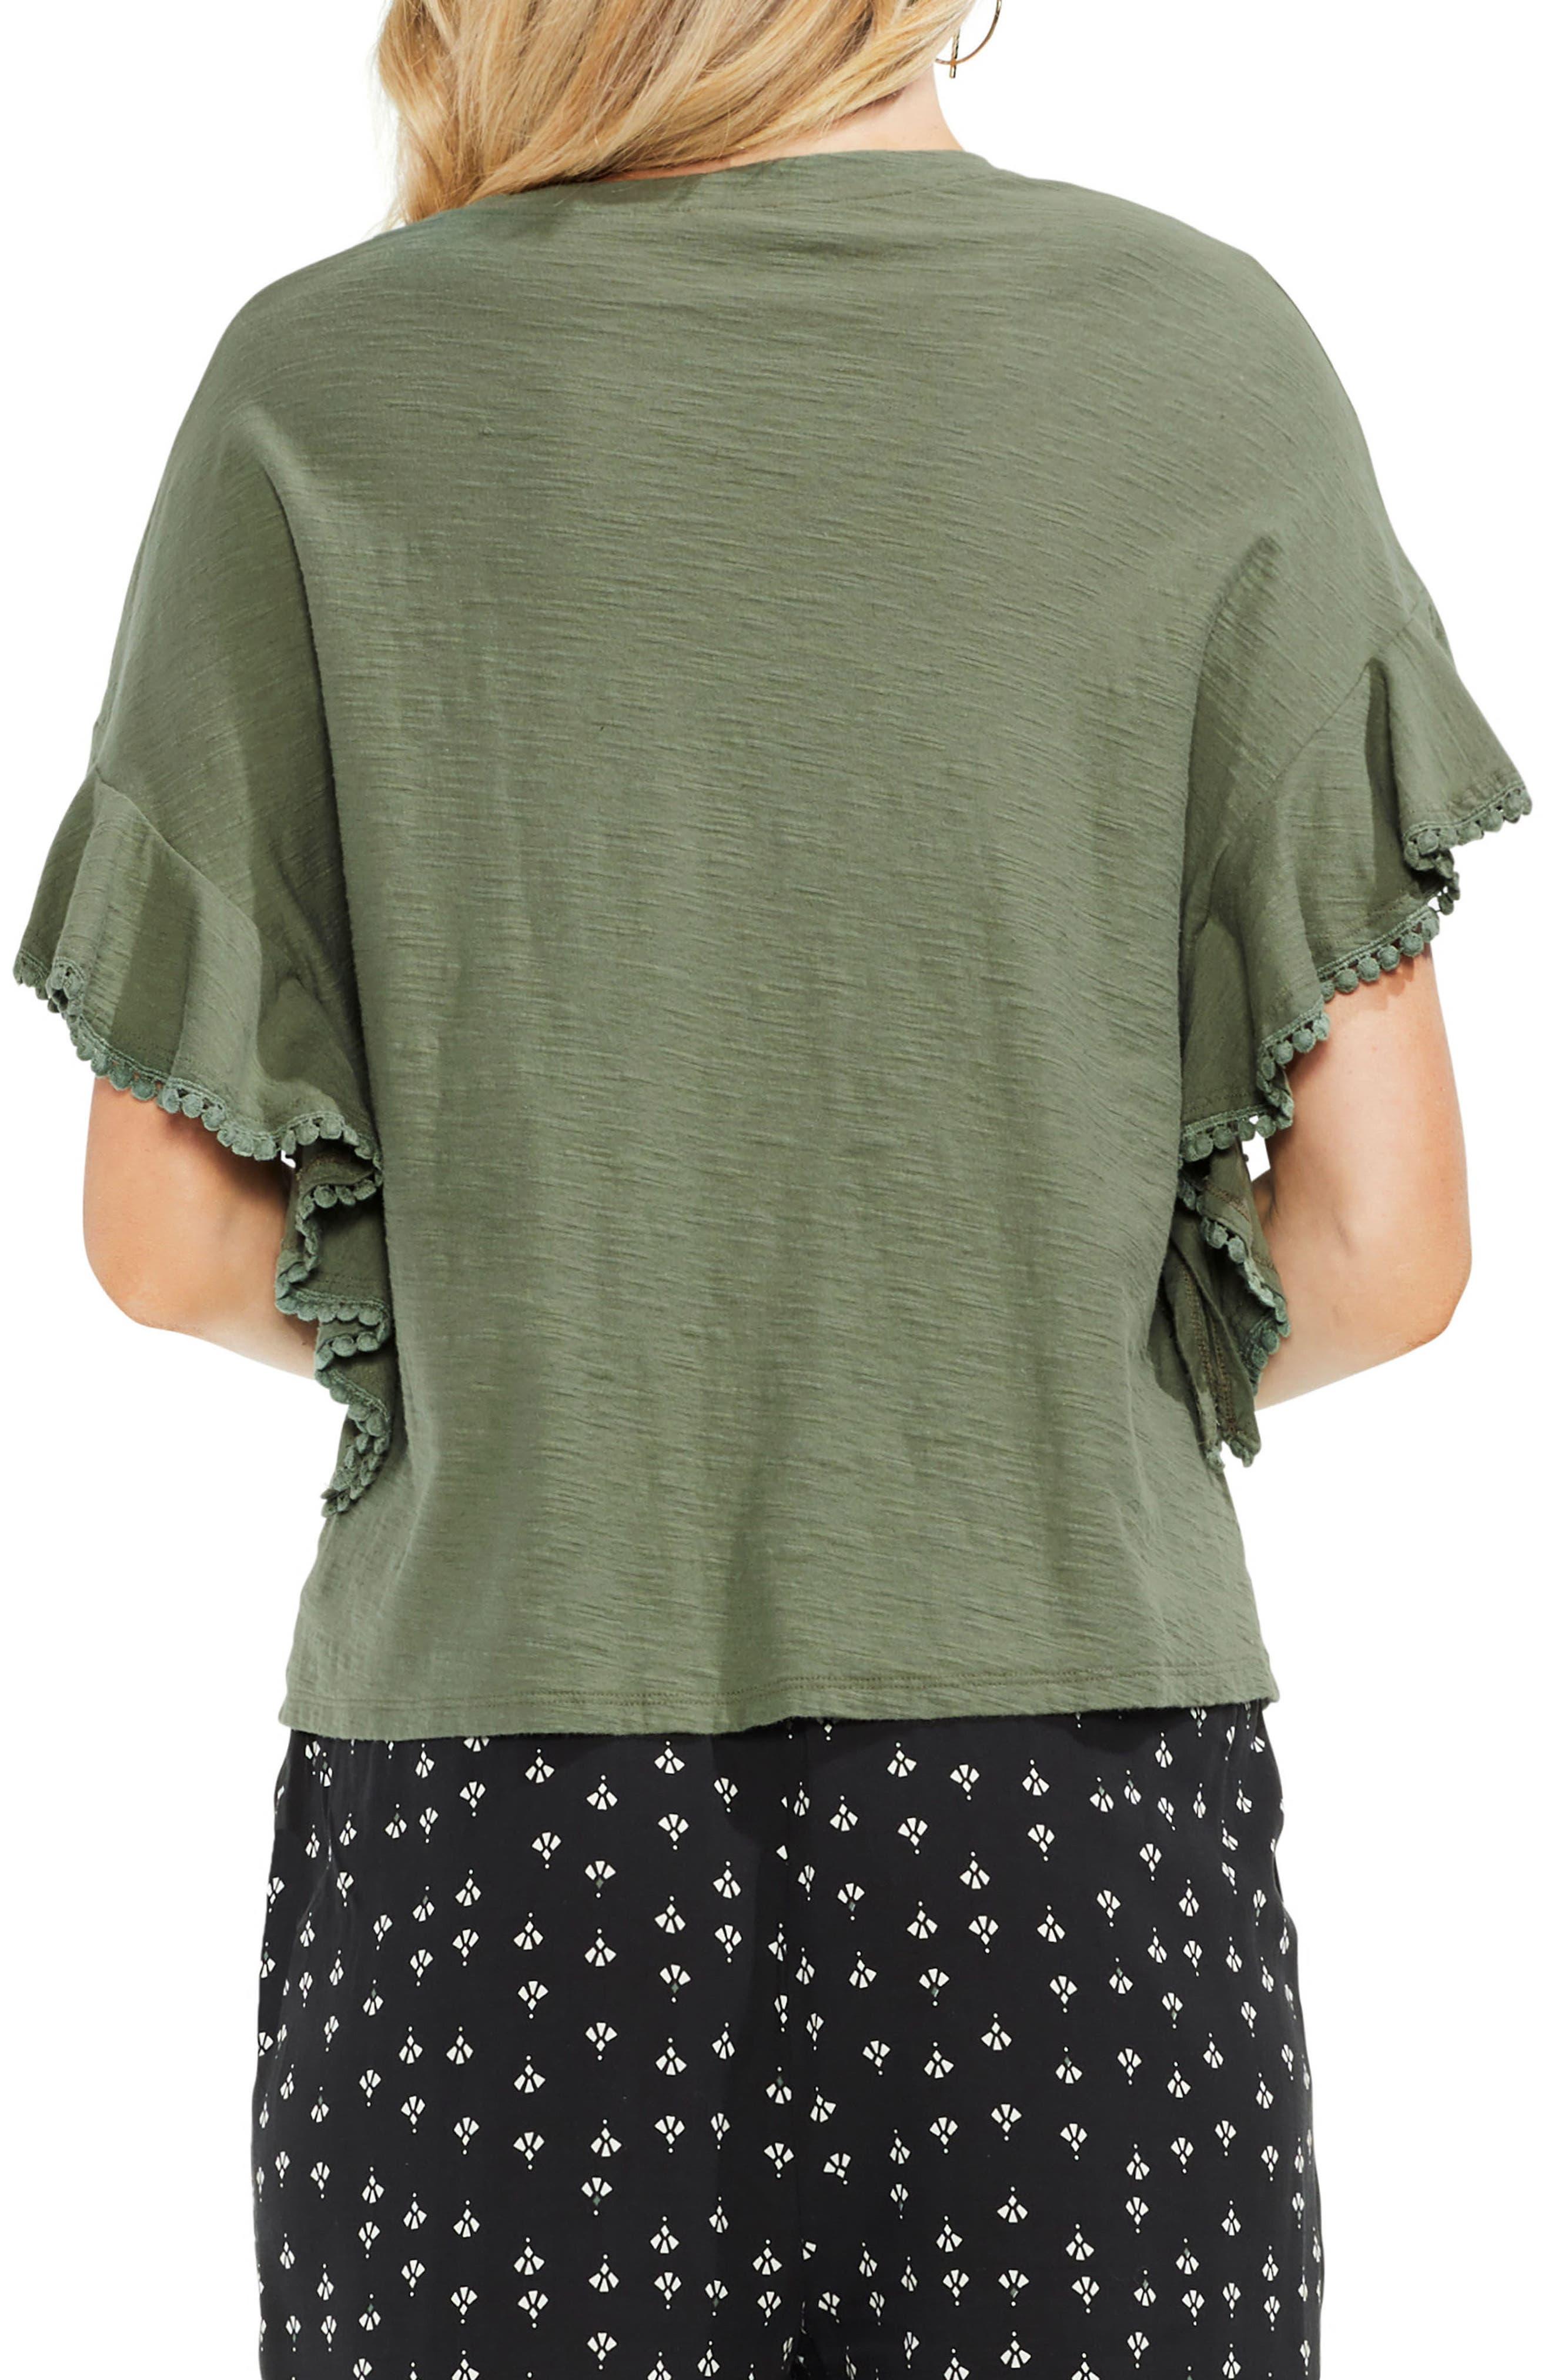 Ruffle Sleeve Tee,                             Alternate thumbnail 2, color,                             Canopy Green